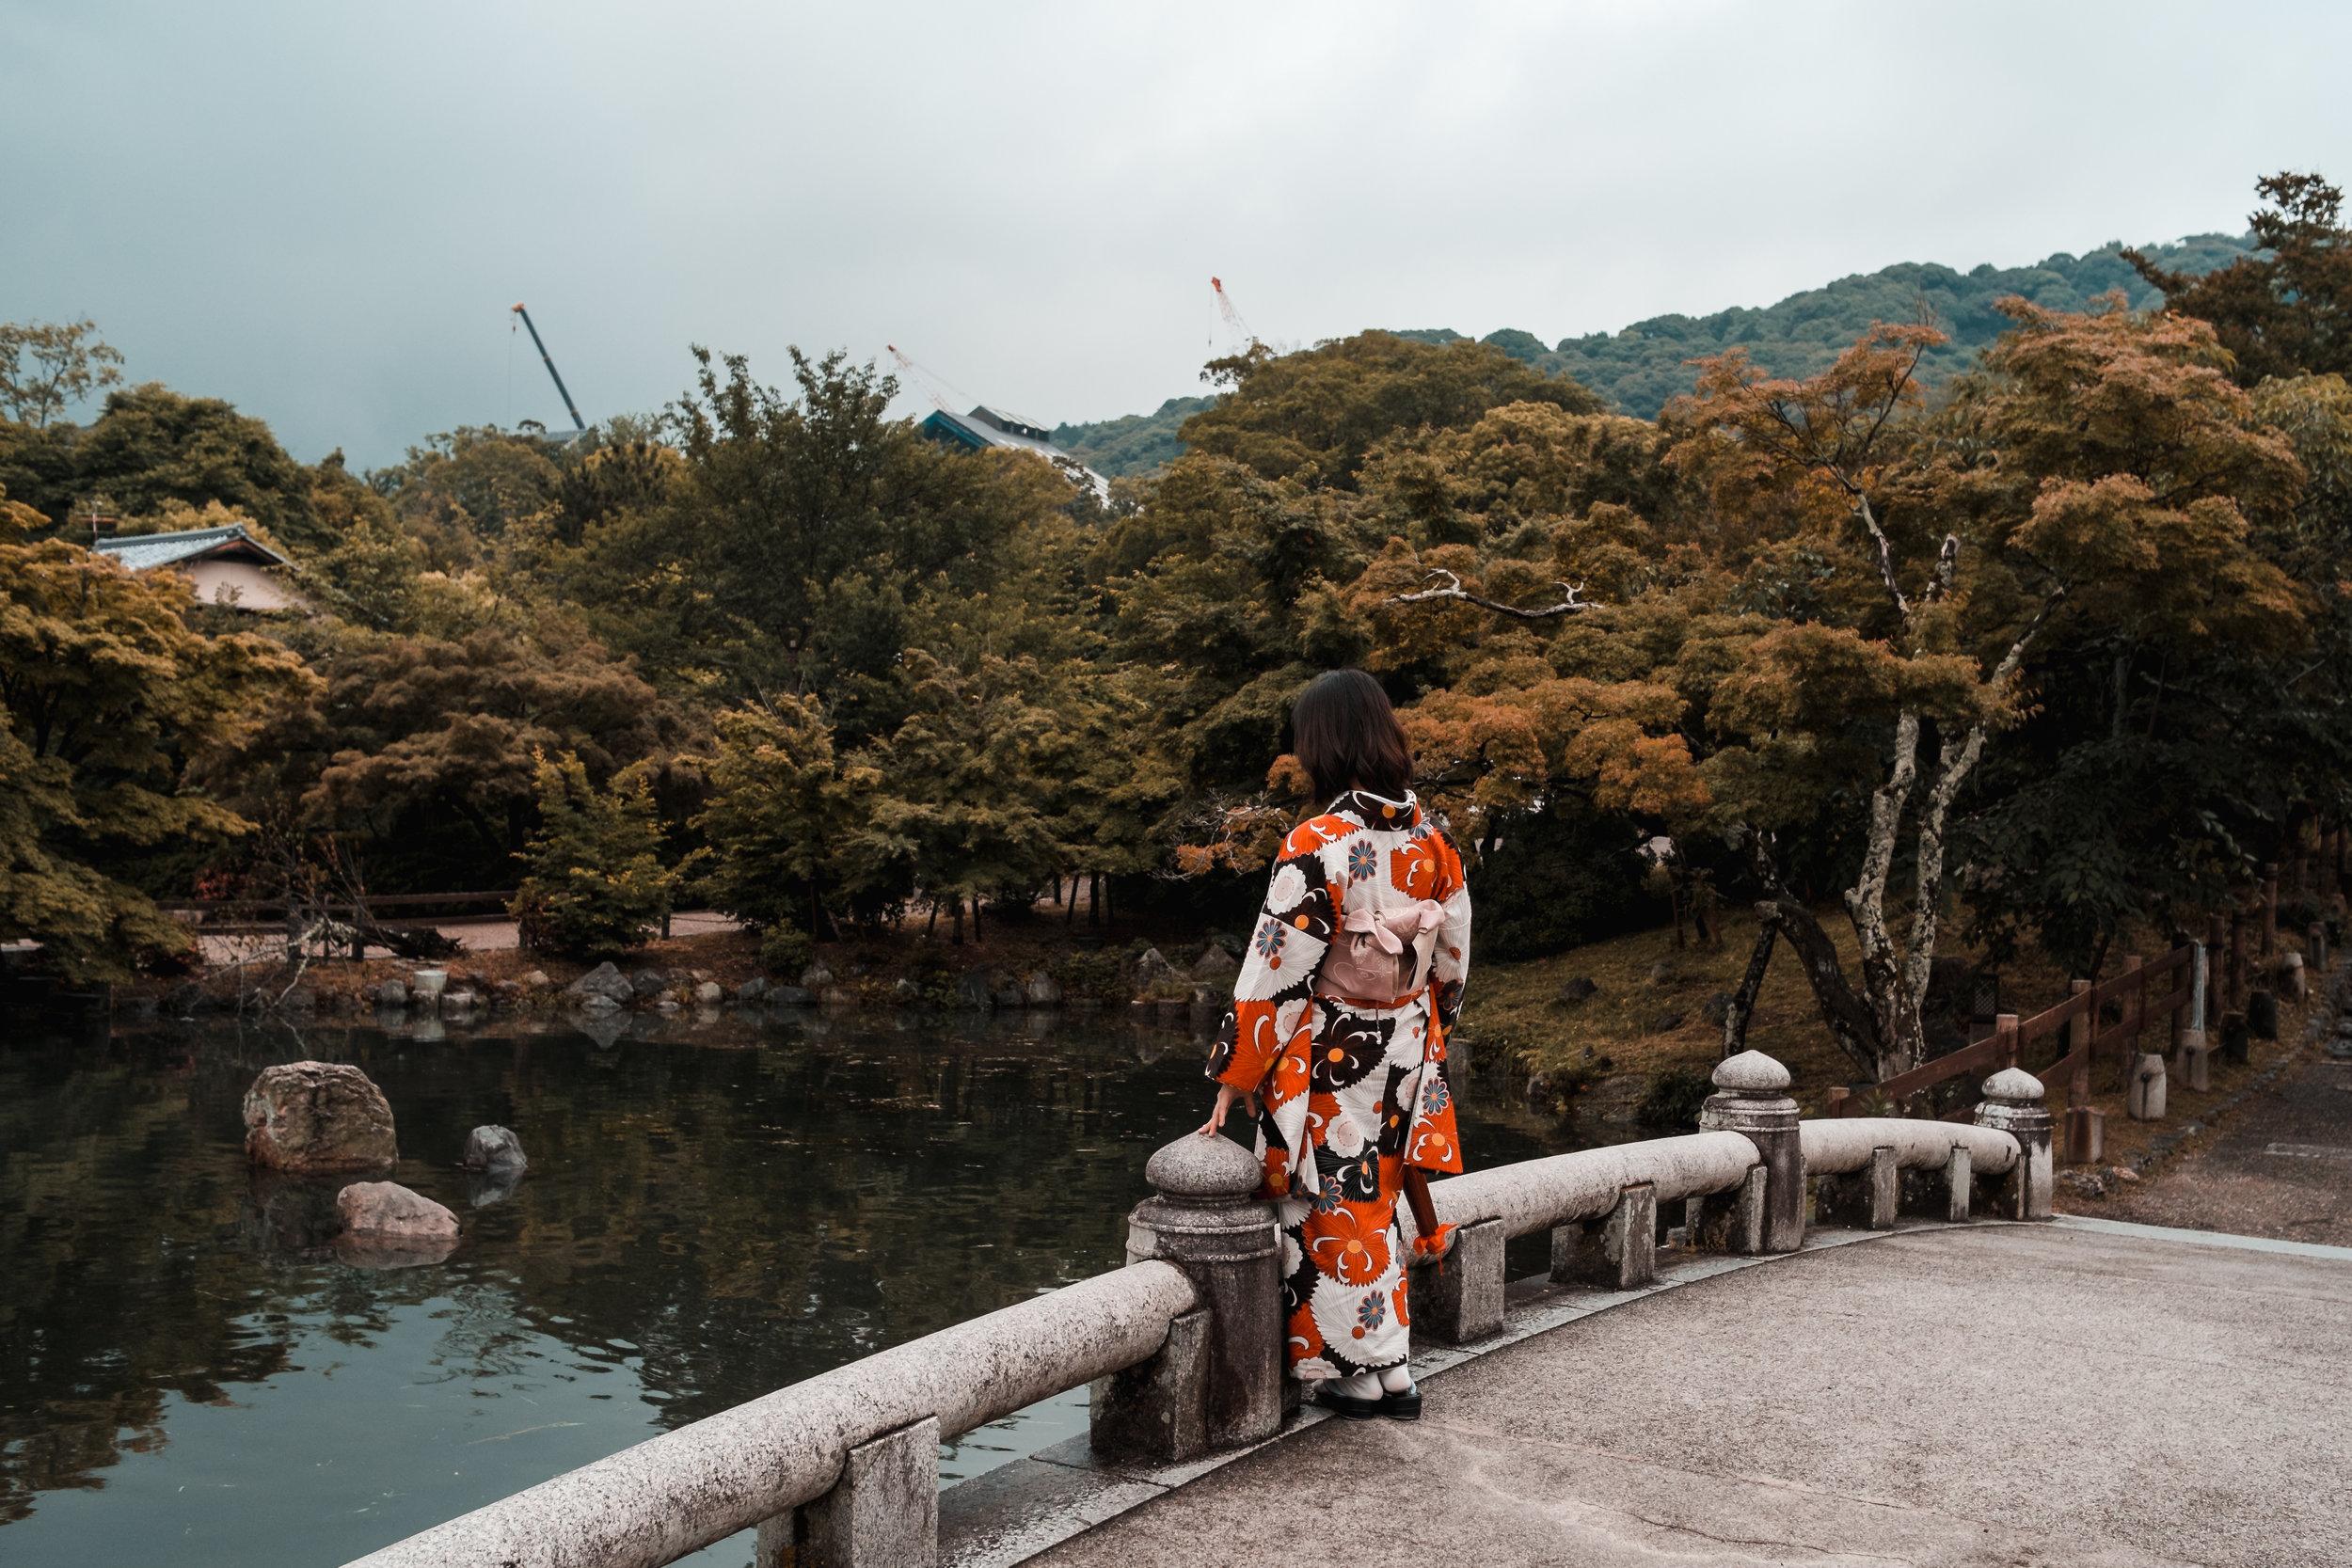 KyotoJapan_2018_AdamDillon_DSCF9680.jpg